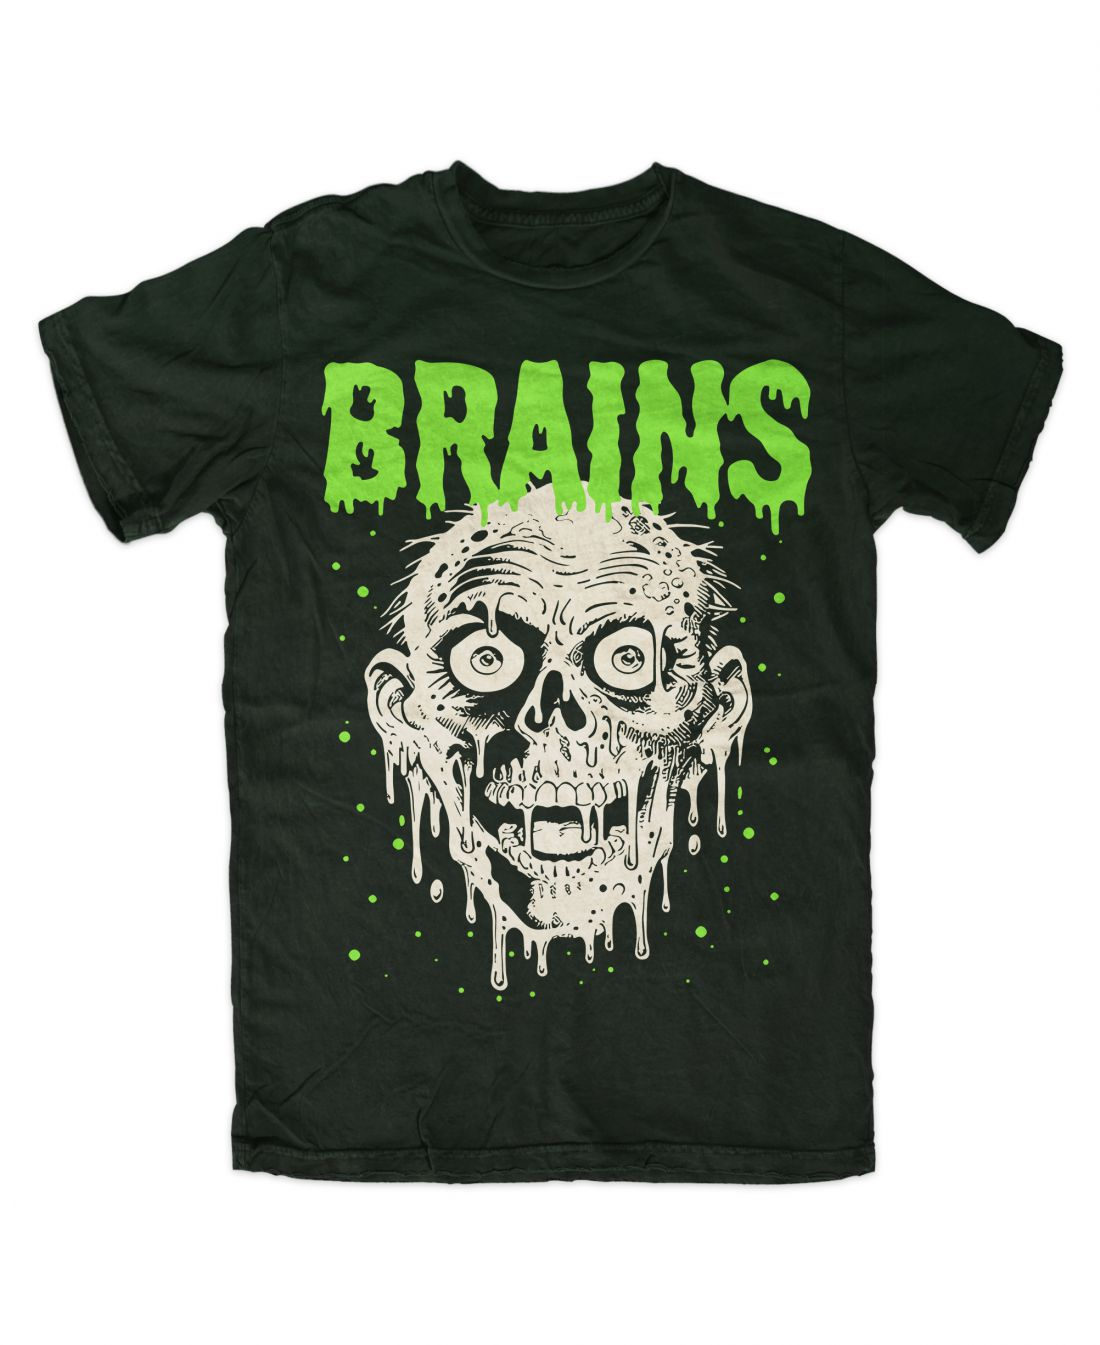 Brains (forest green póló)